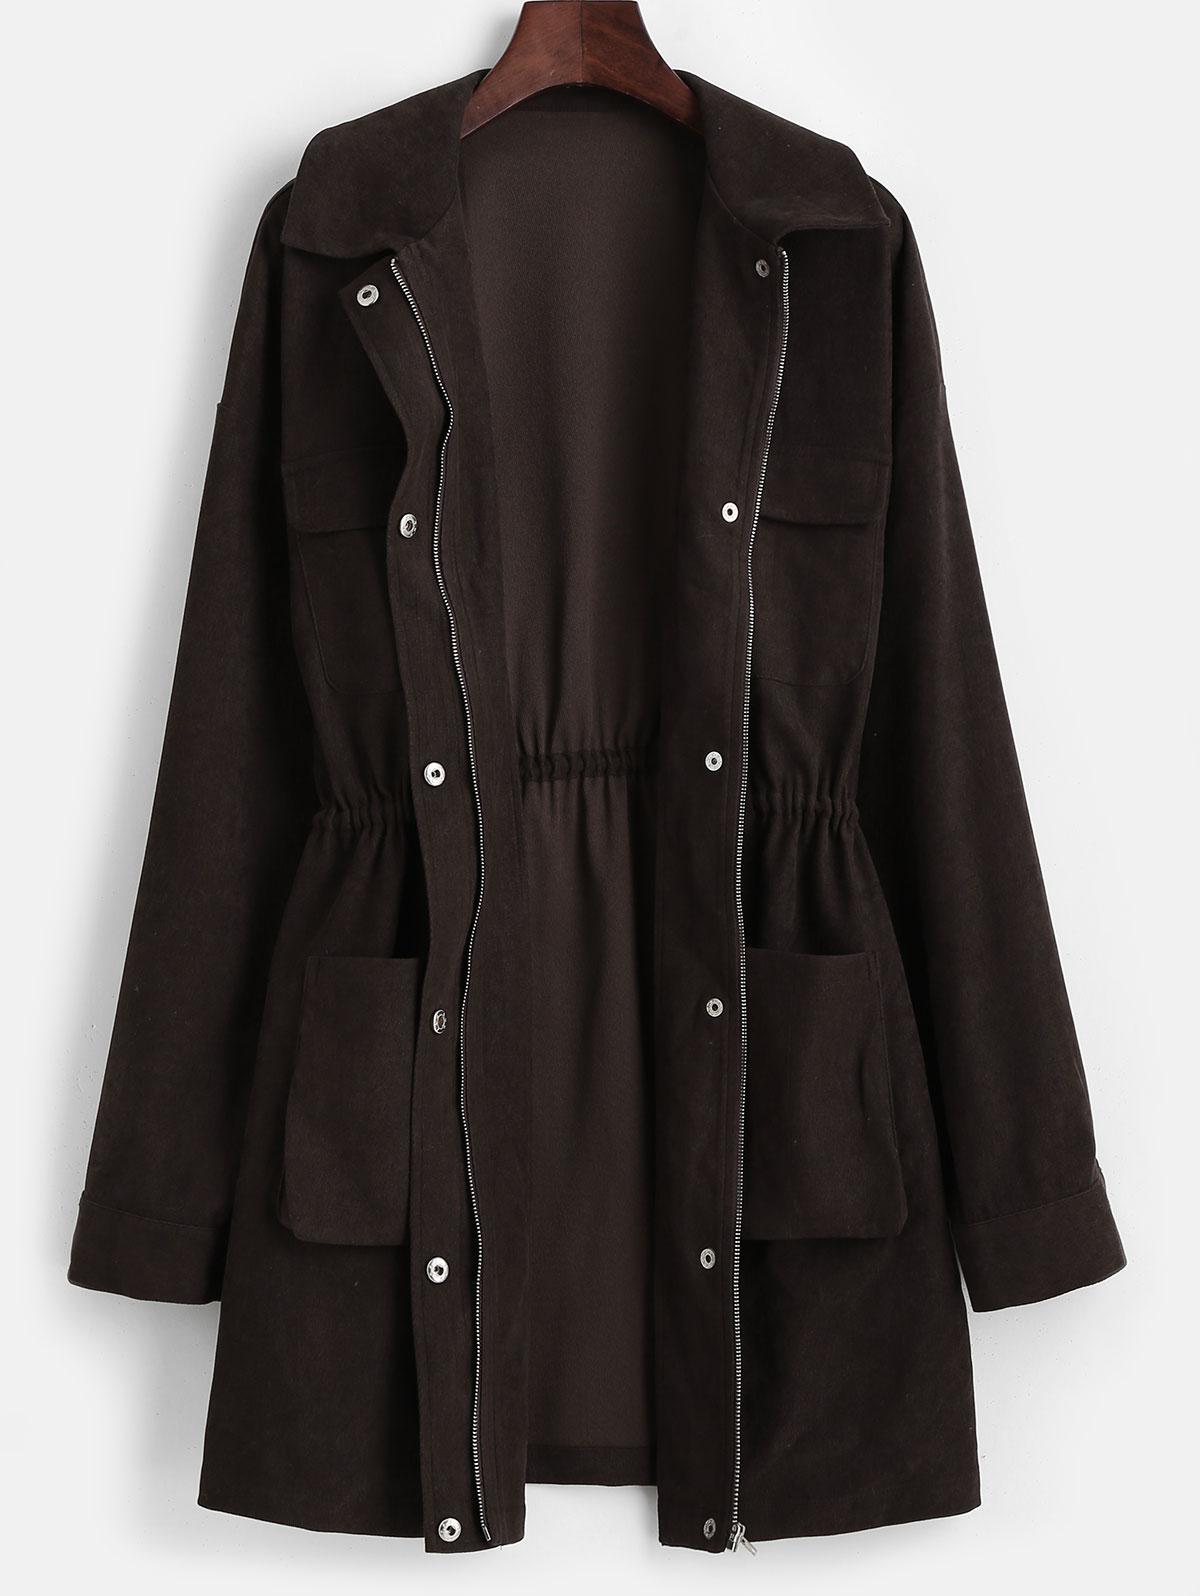 Manteau Long Zippé avec Poches avec Bouton Pression - ZAFUL - Modalova